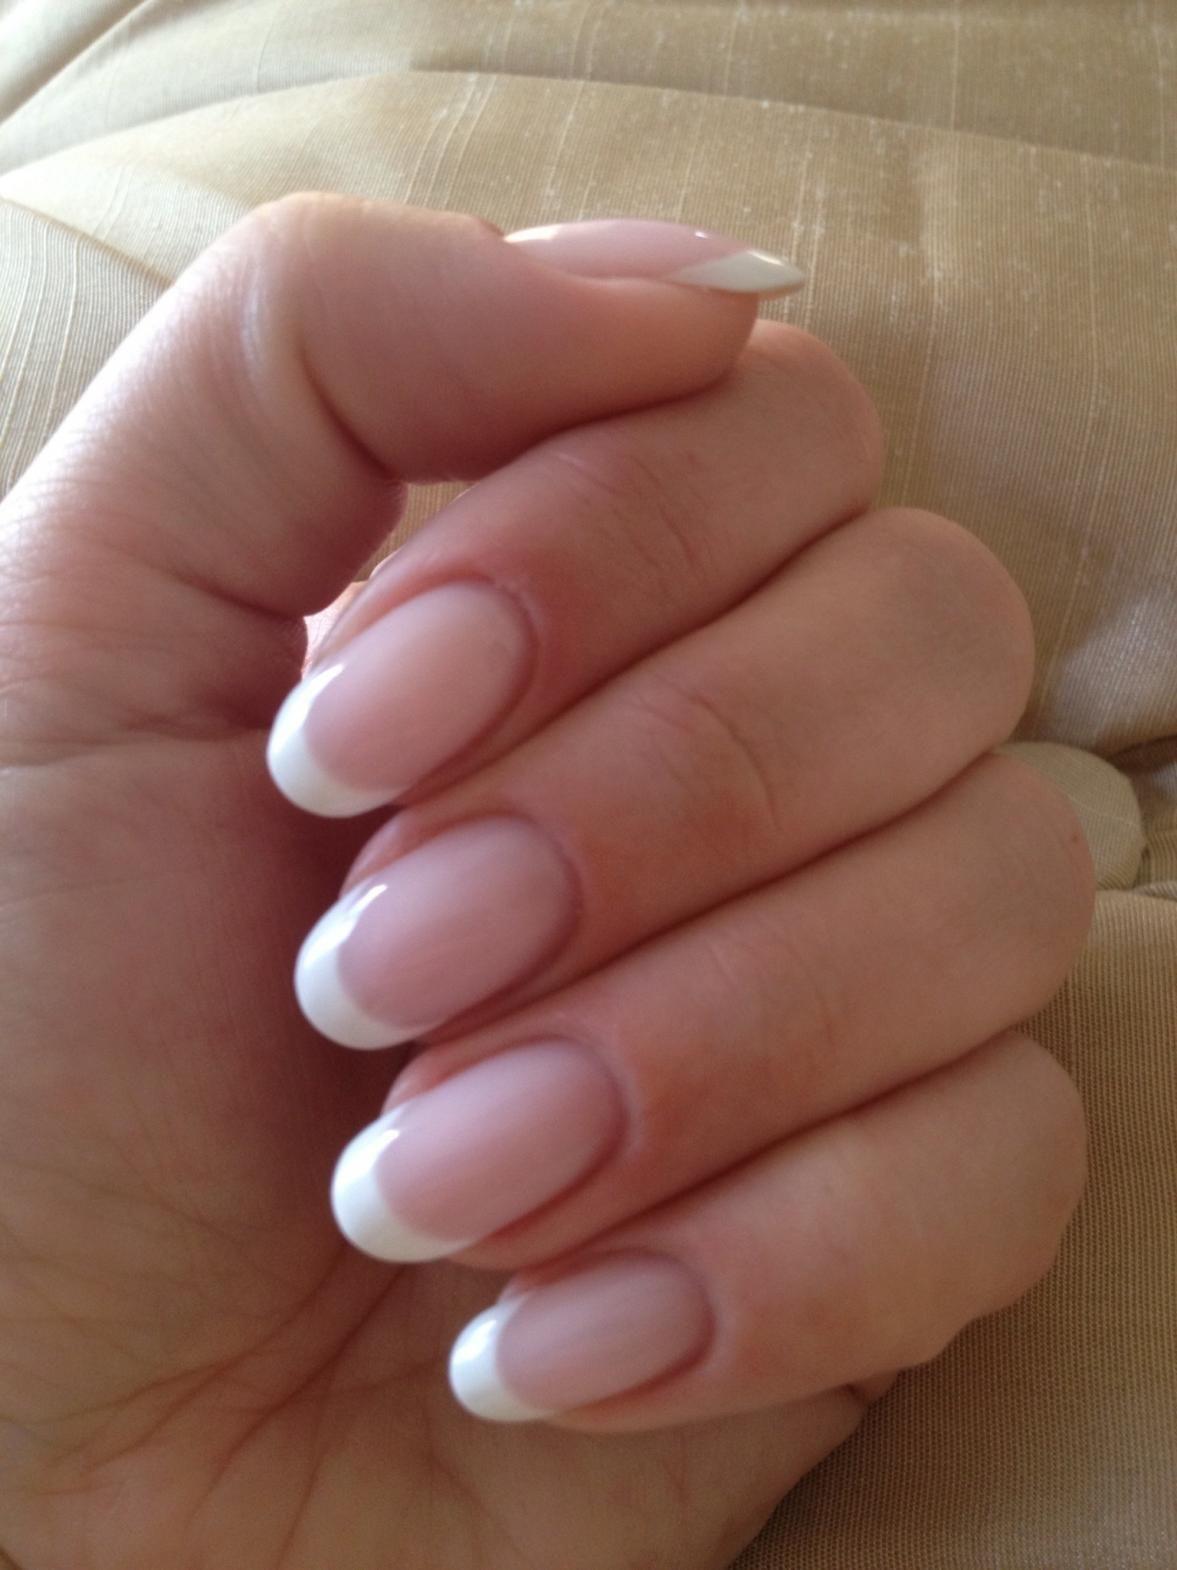 french | Unghie mania | Pinterest | Manicure, Make up and Mani pedi